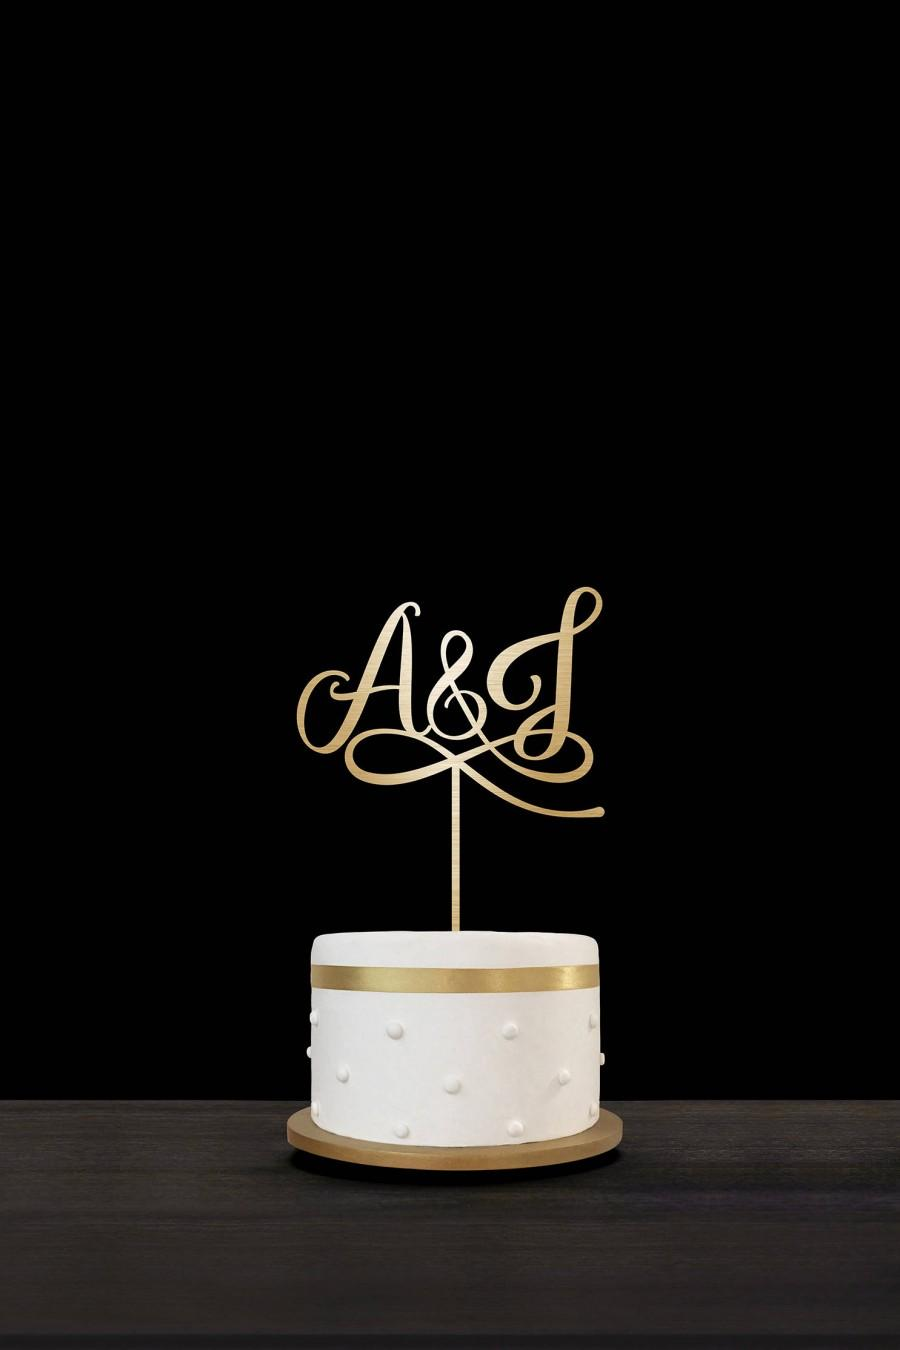 Hochzeit - Customized Wedding Cake Topper Initials Personalized Cake Topper for Wedding, Custom Personalized Wedding Cake Topper, Monogram Cake Topper